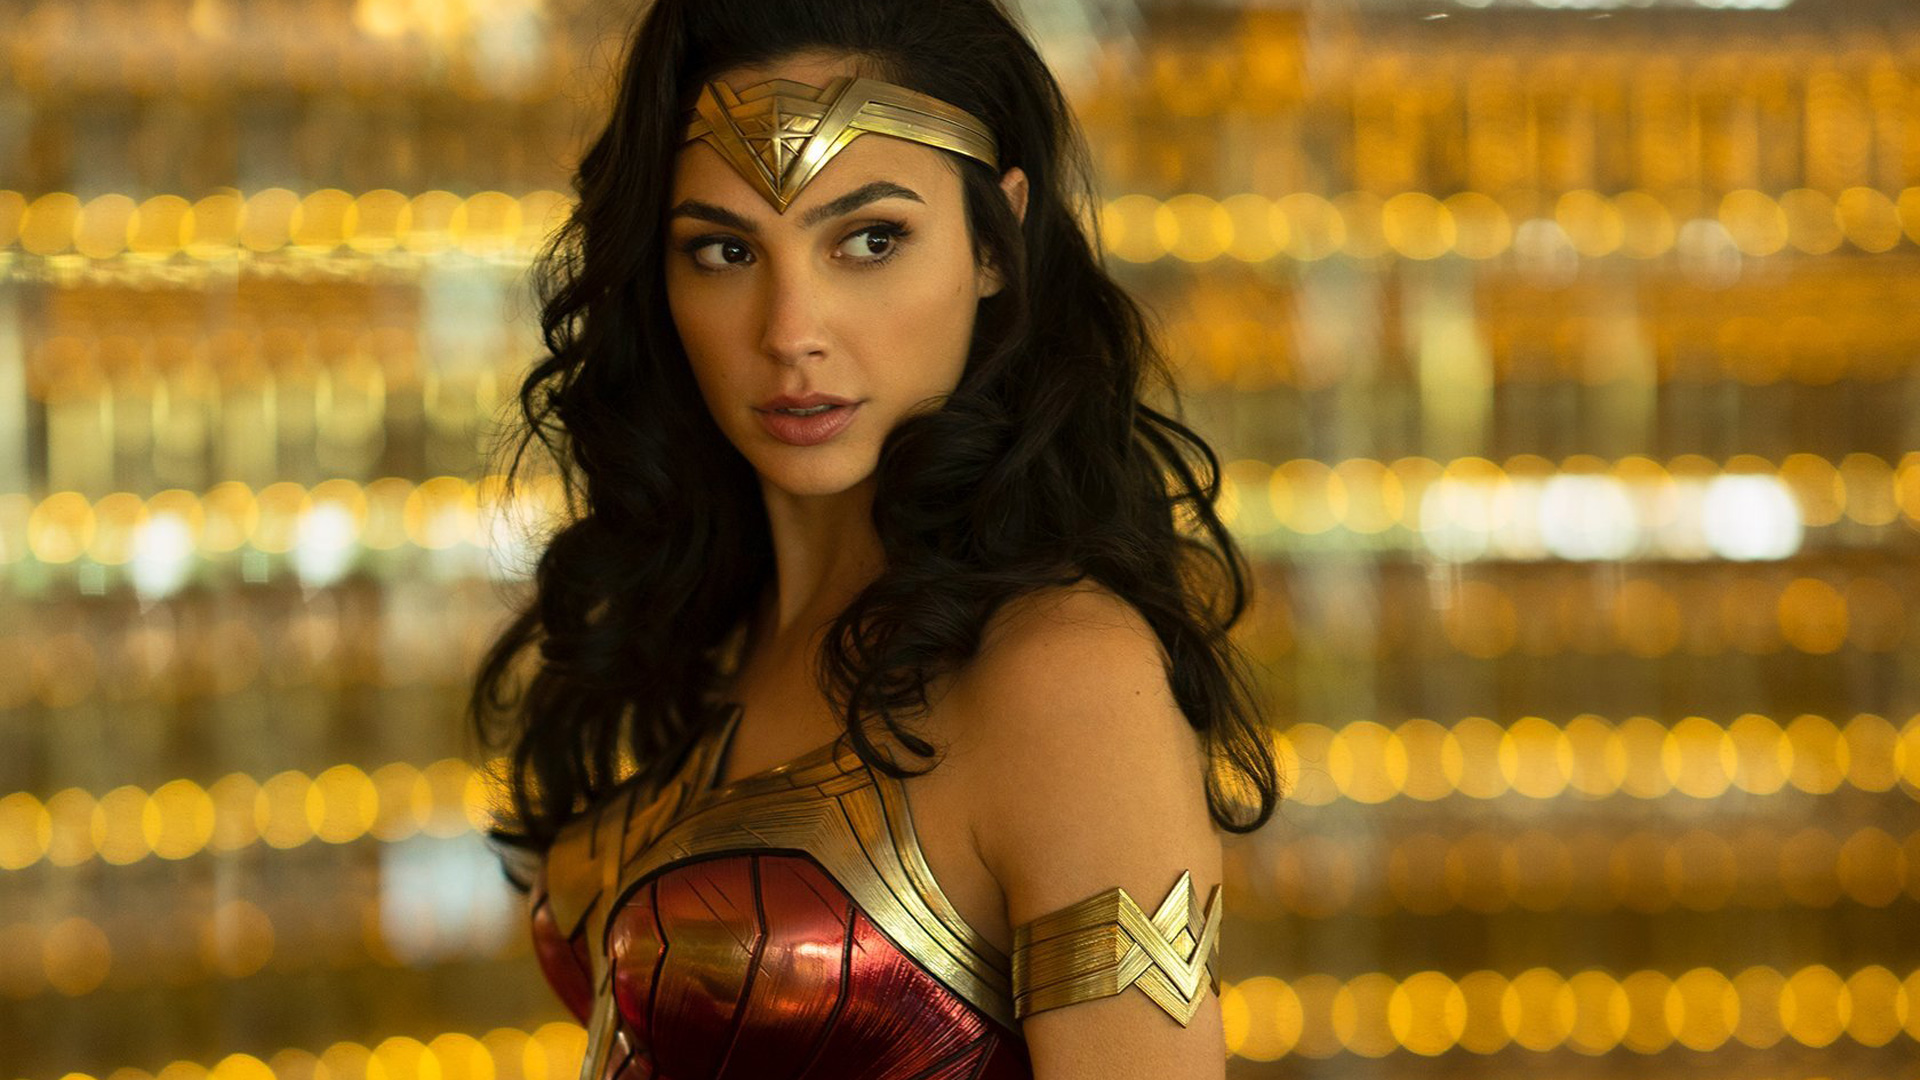 Wallpaper Gal Gadot Wonder Woman Hd Movies 7553: 1680x1050 Gal Gadot Wonder Woman 1984 Movie 1680x1050